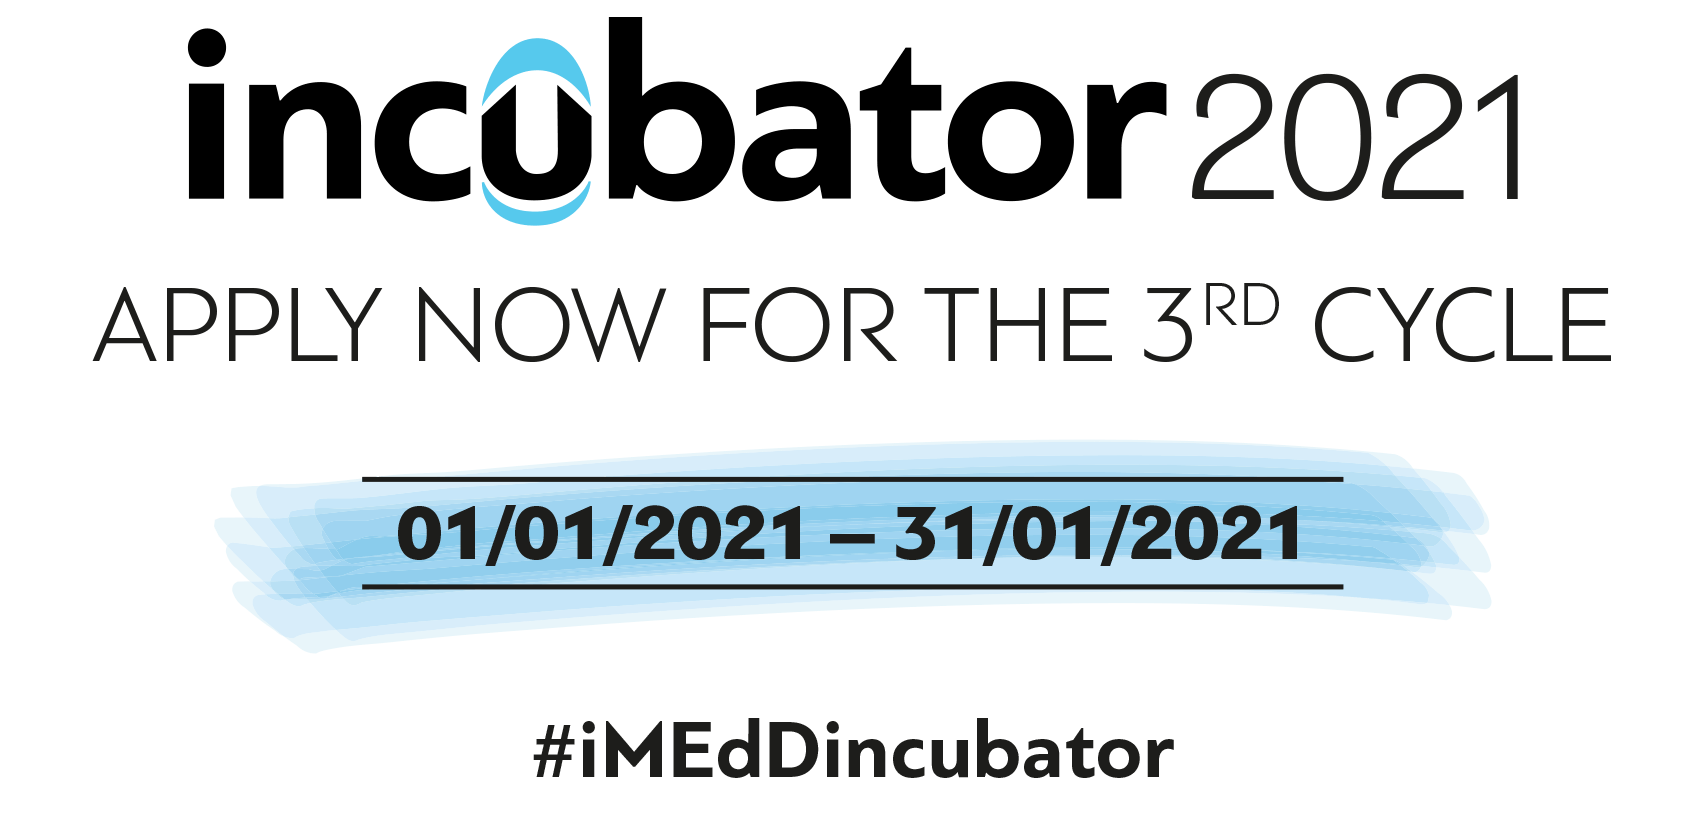 Incubator 2021